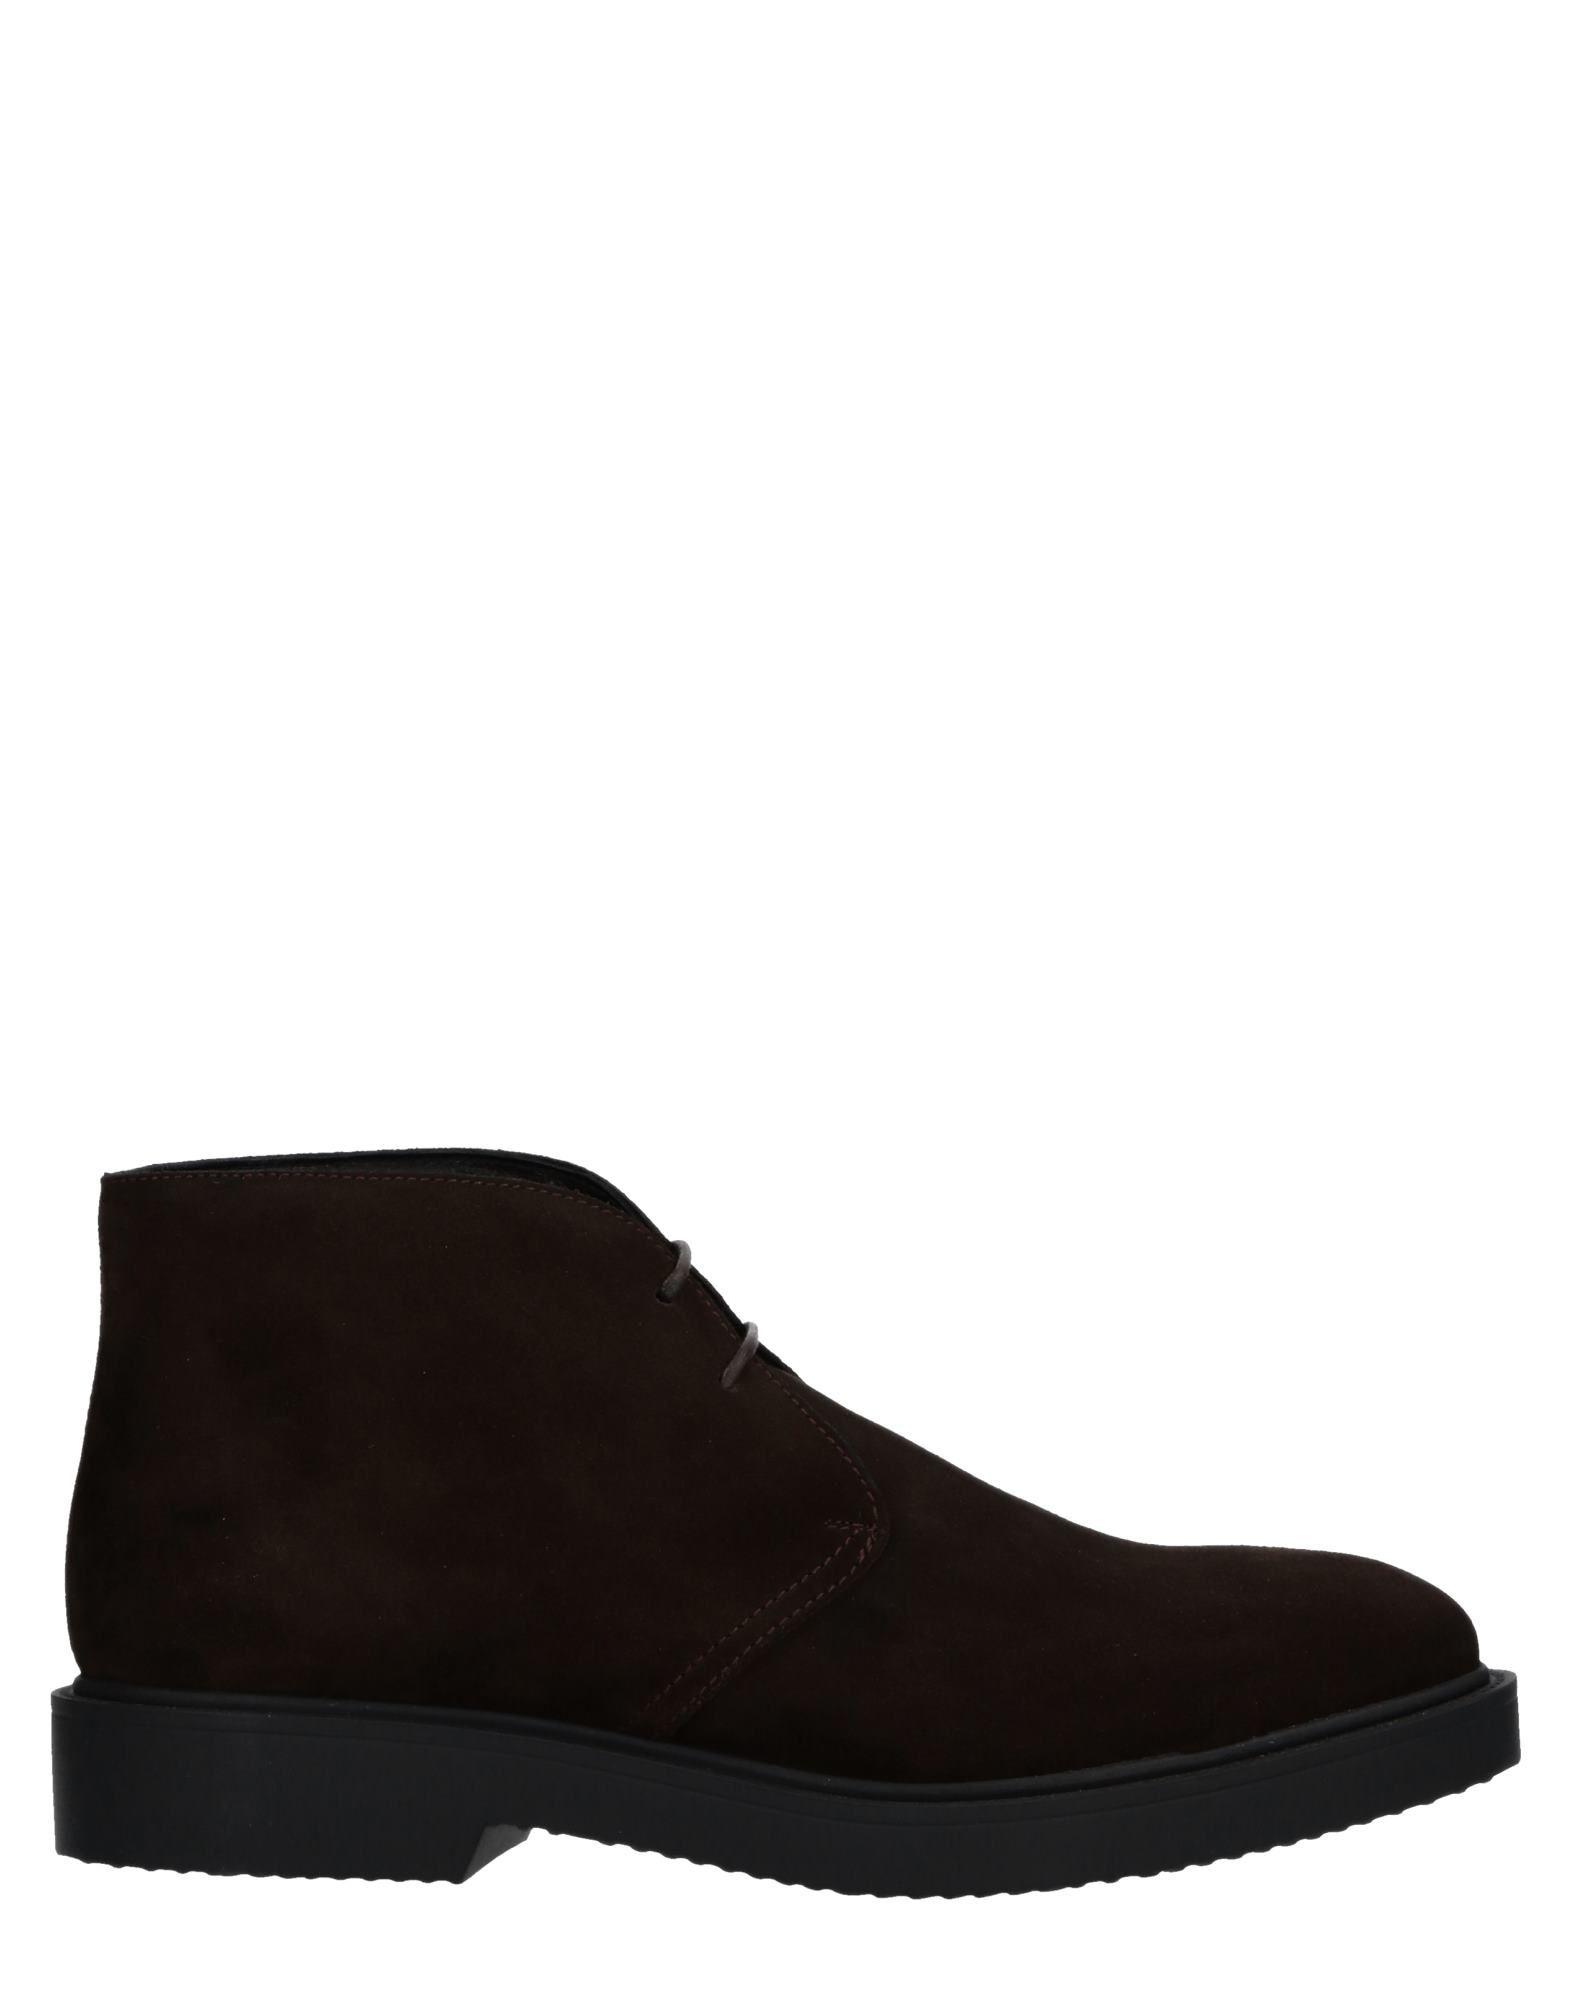 SEBOYS Boots in Dark Brown